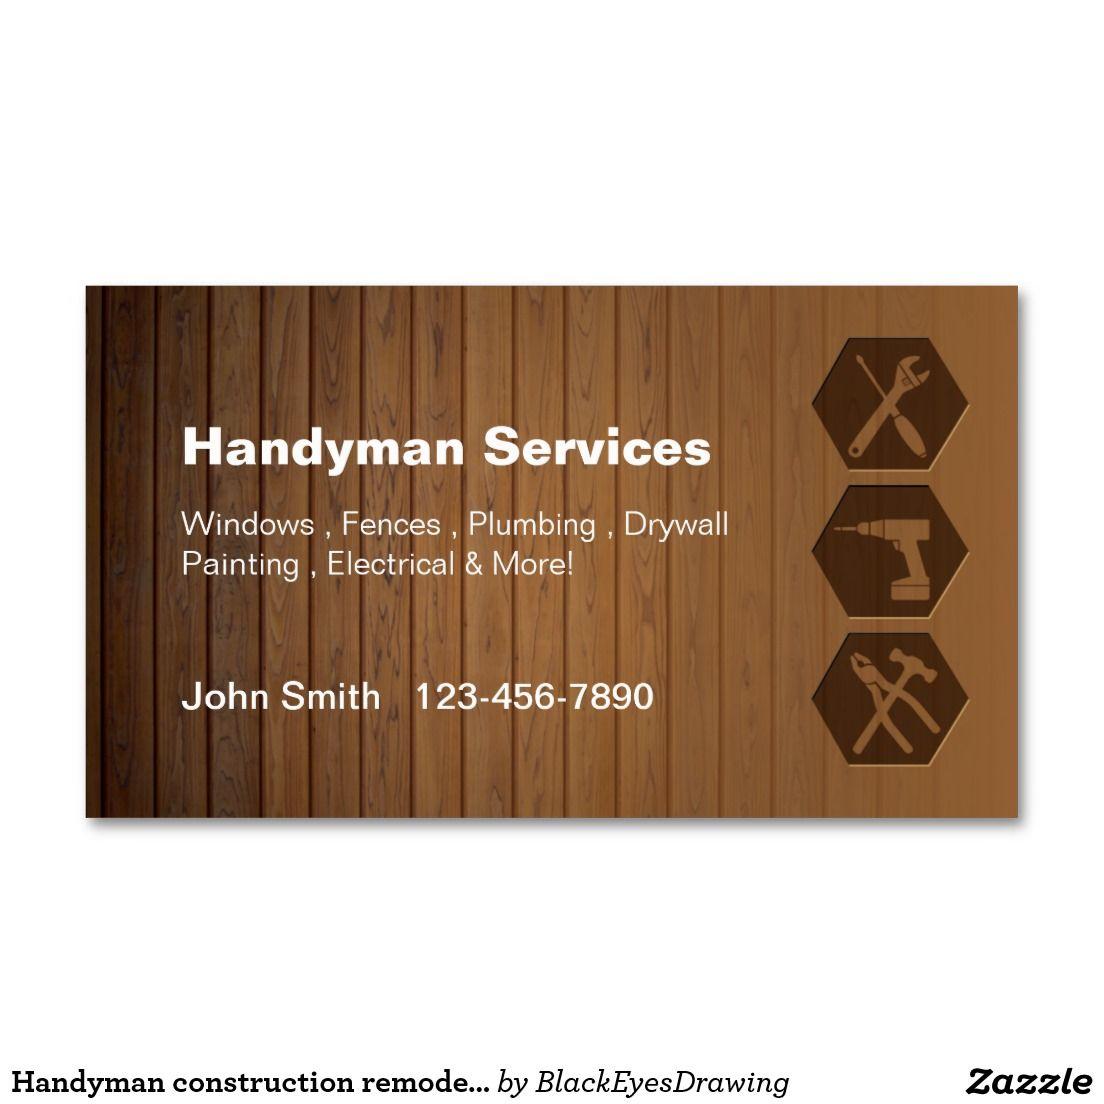 Handyman Construction Remodeling Business Cards Zazzle Com Construction Remodeling Remodeling Business Handyman